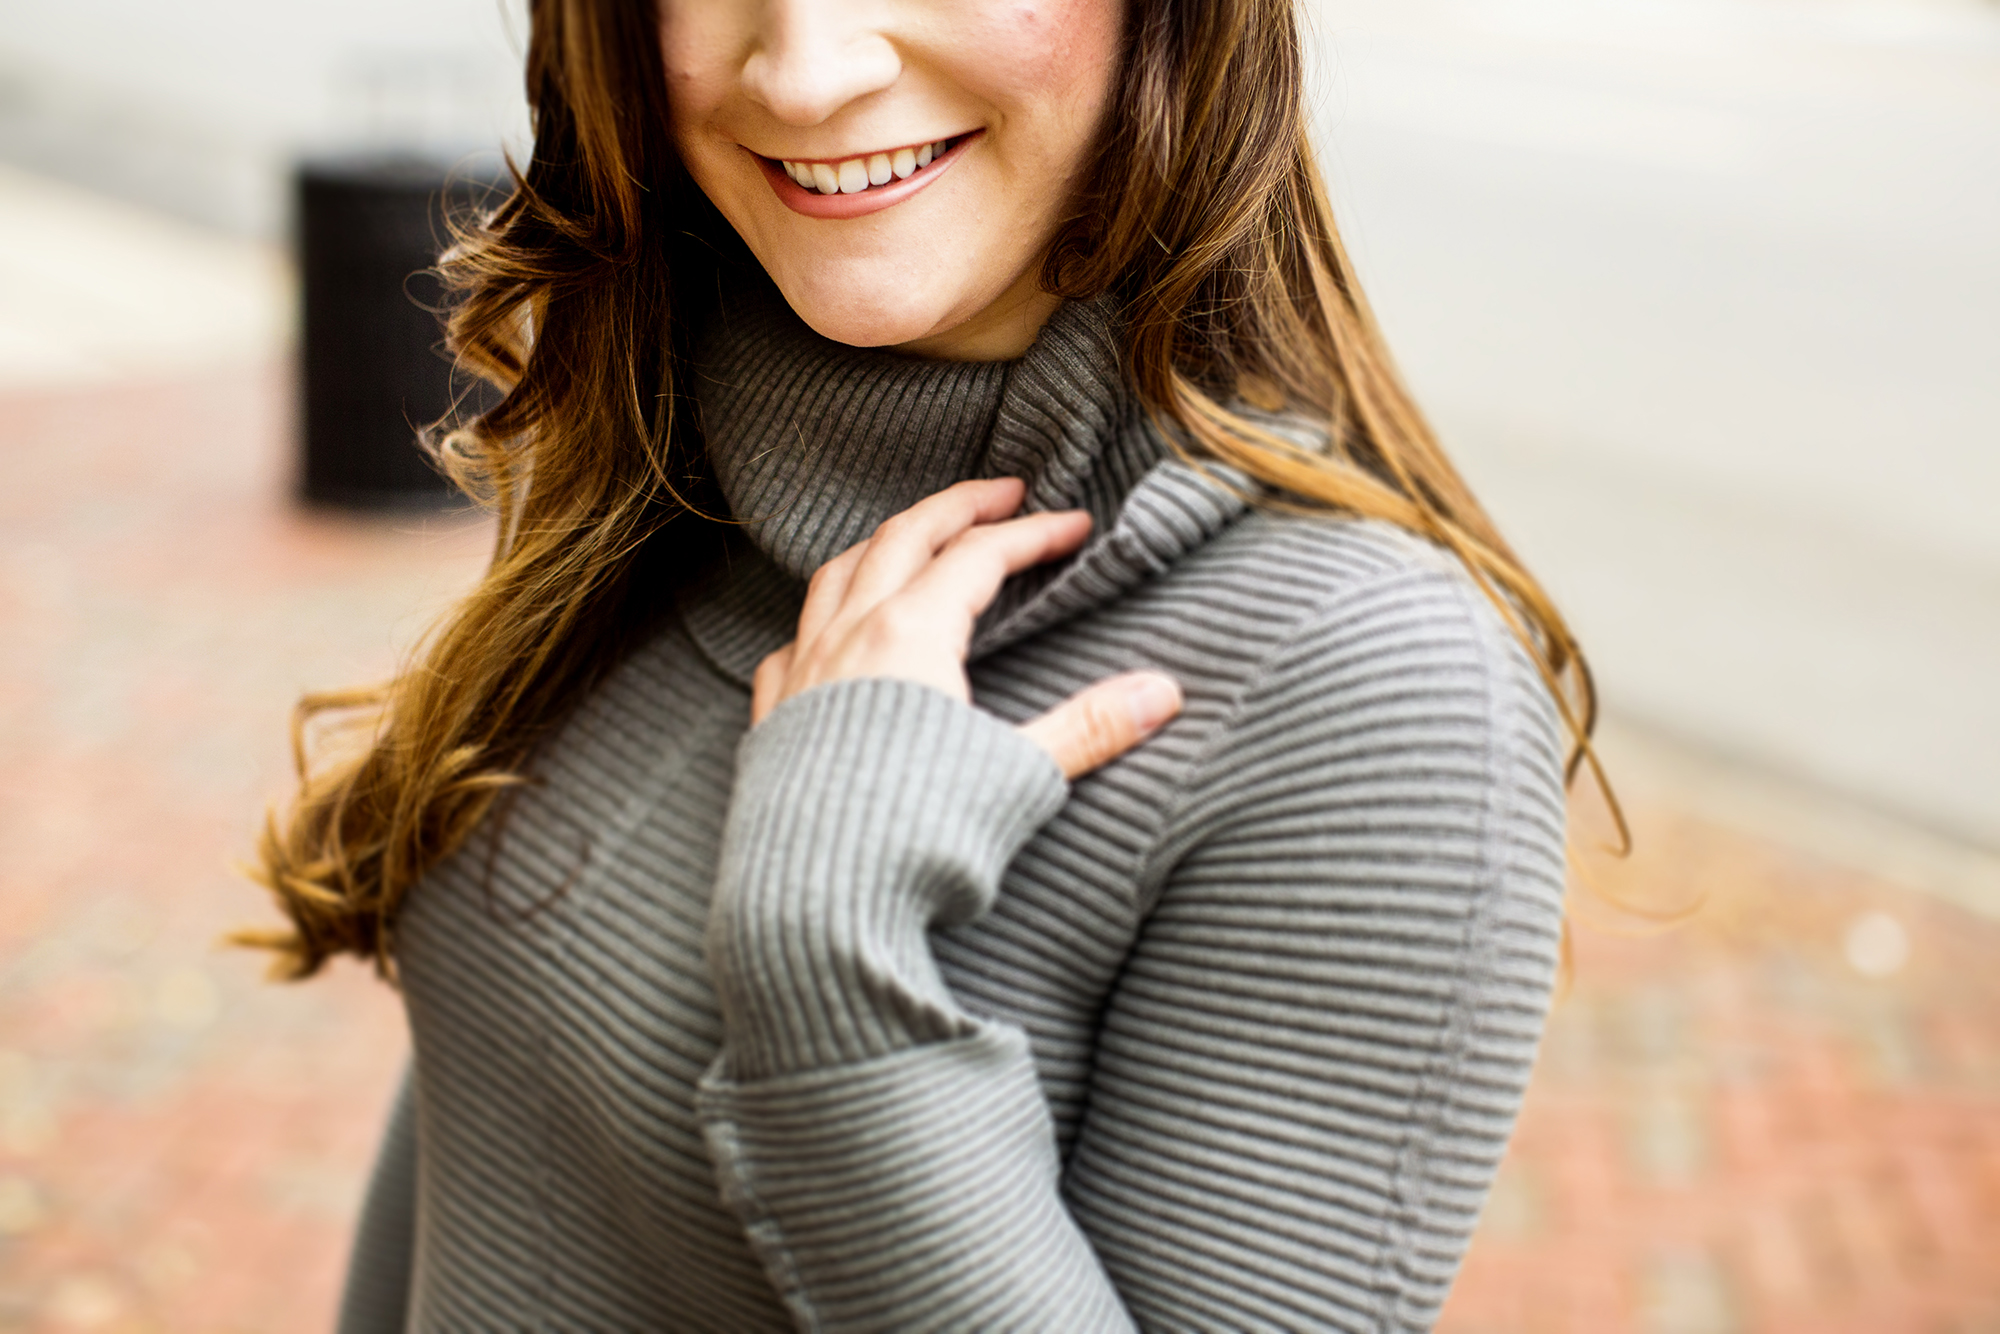 Seriously_Sabrina_Photography_Ashland_Kentucky_Fashion_Blogger_Portraits_LaurenFannin14.jpg